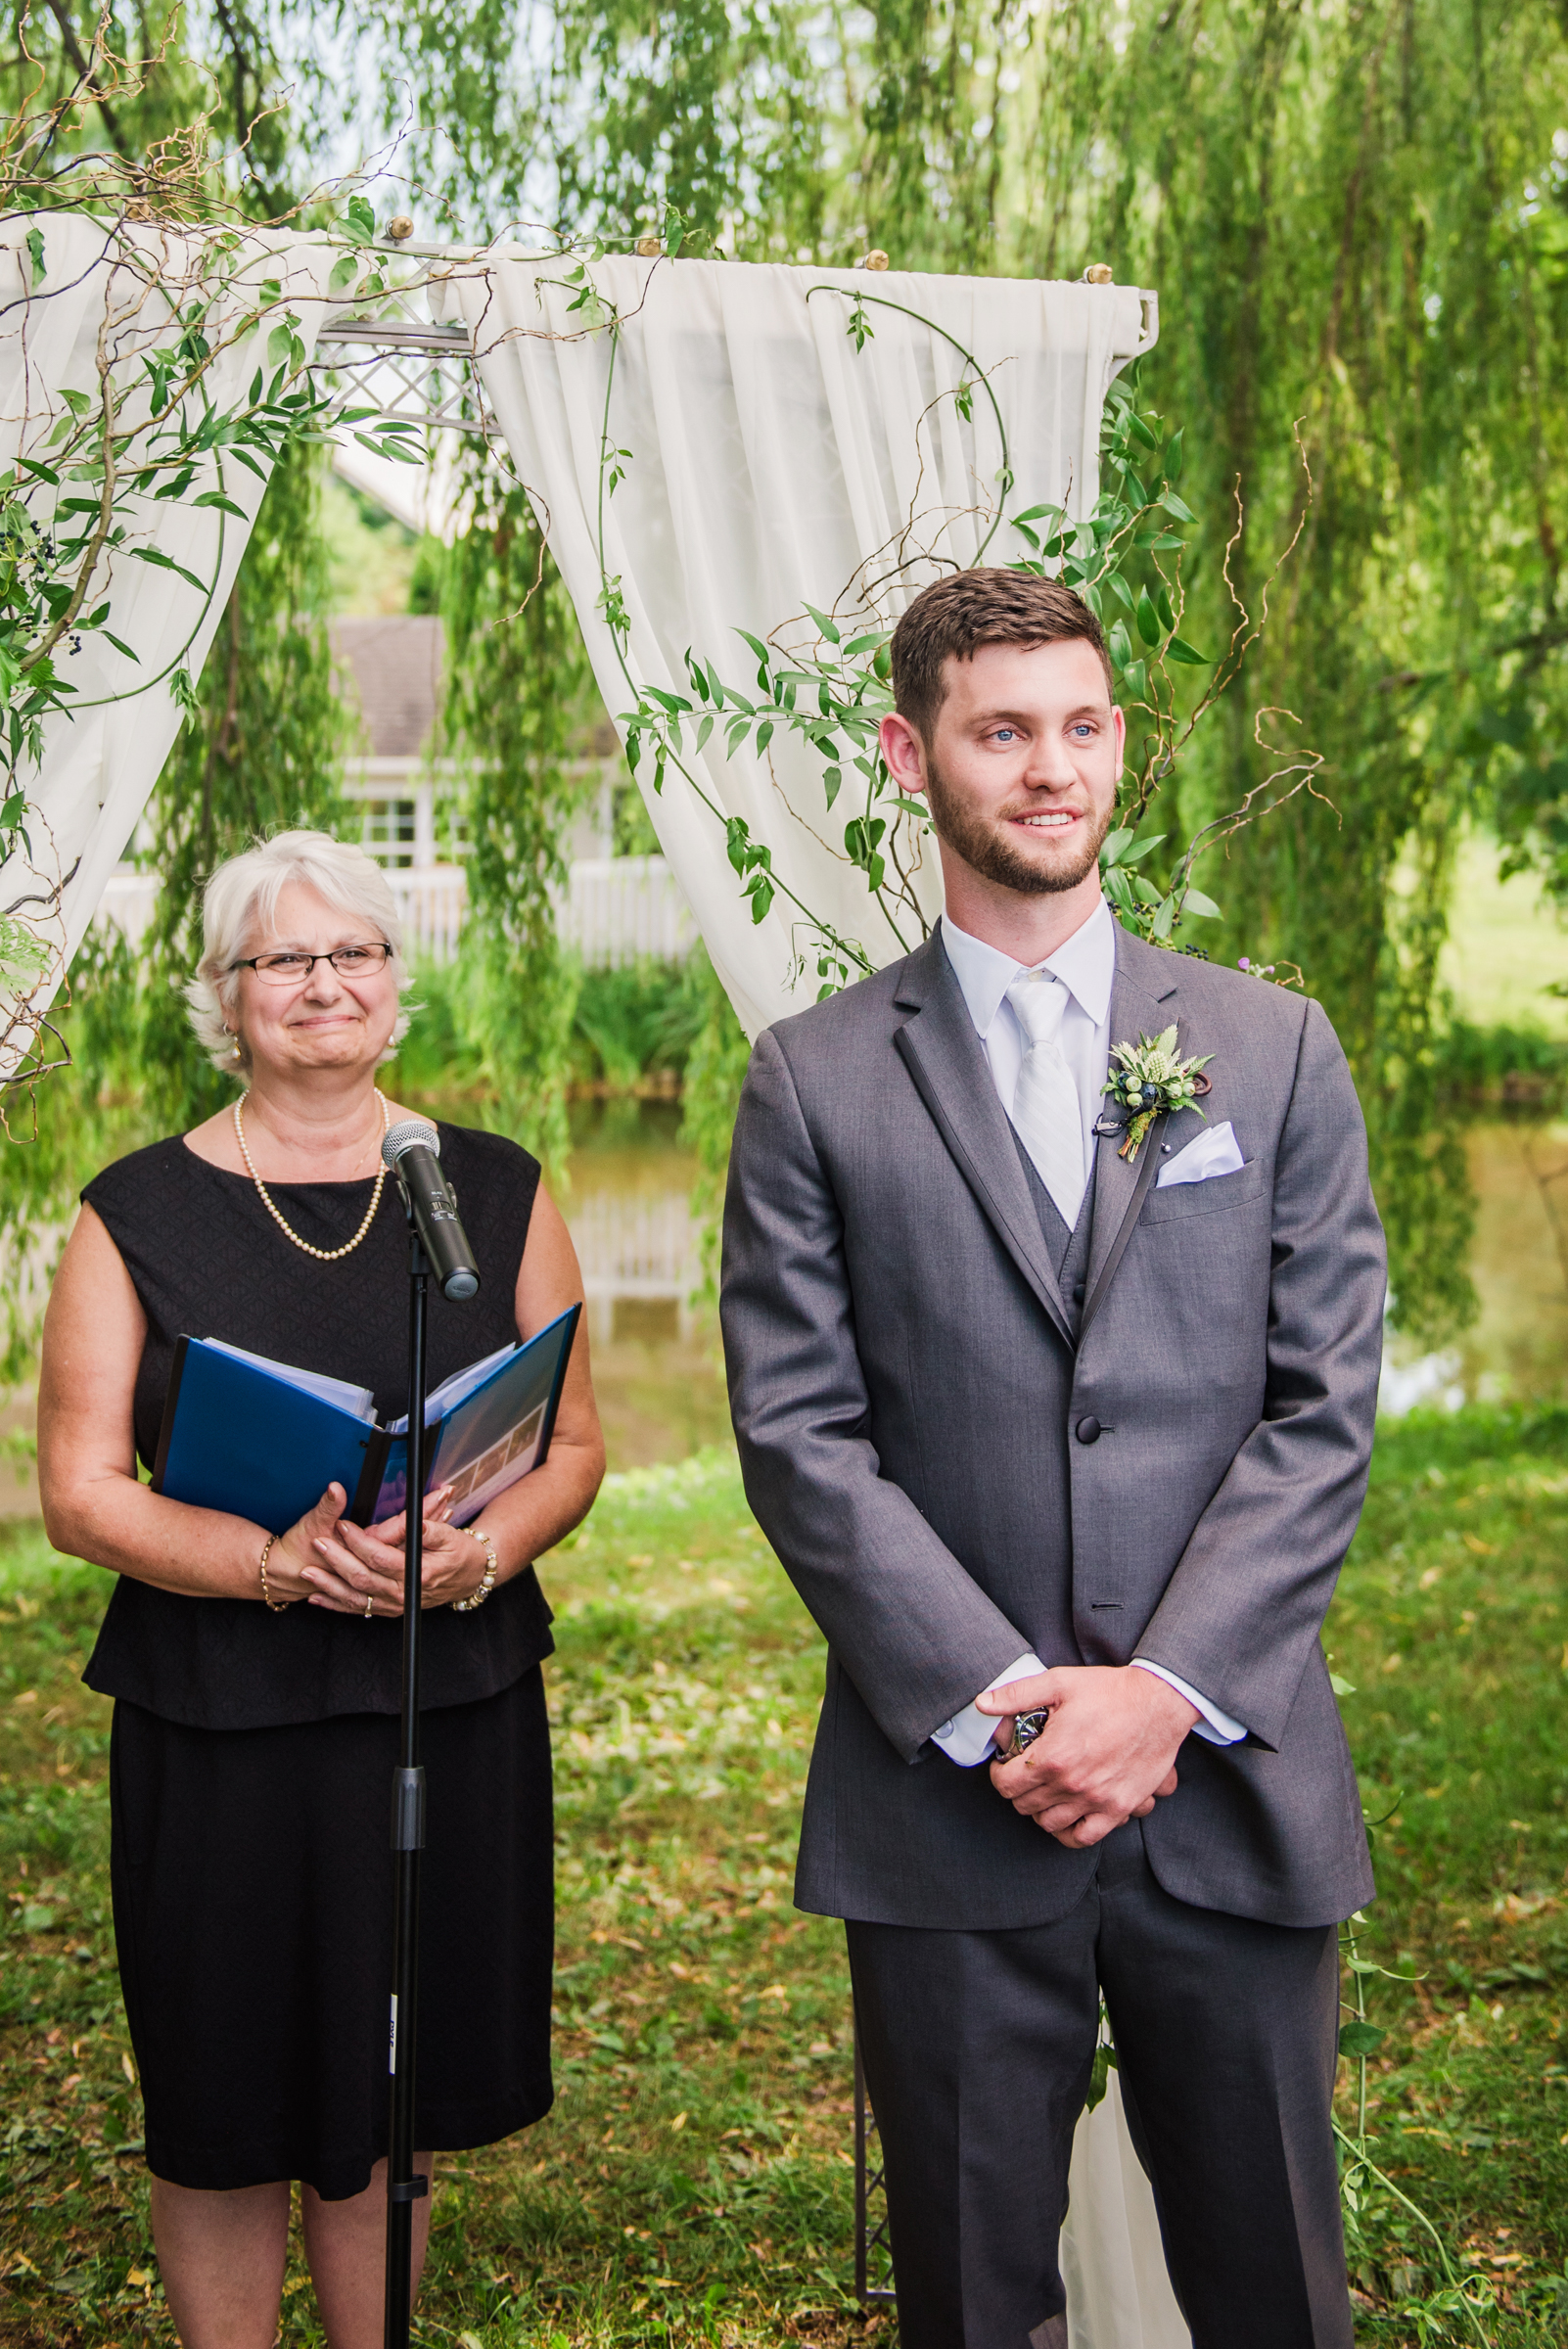 Jerris_Wadsworth_Wedding_Barn_Rochester_Wedding_JILL_STUDIO_Rochester_NY_Photographer_DSC_2598.jpg